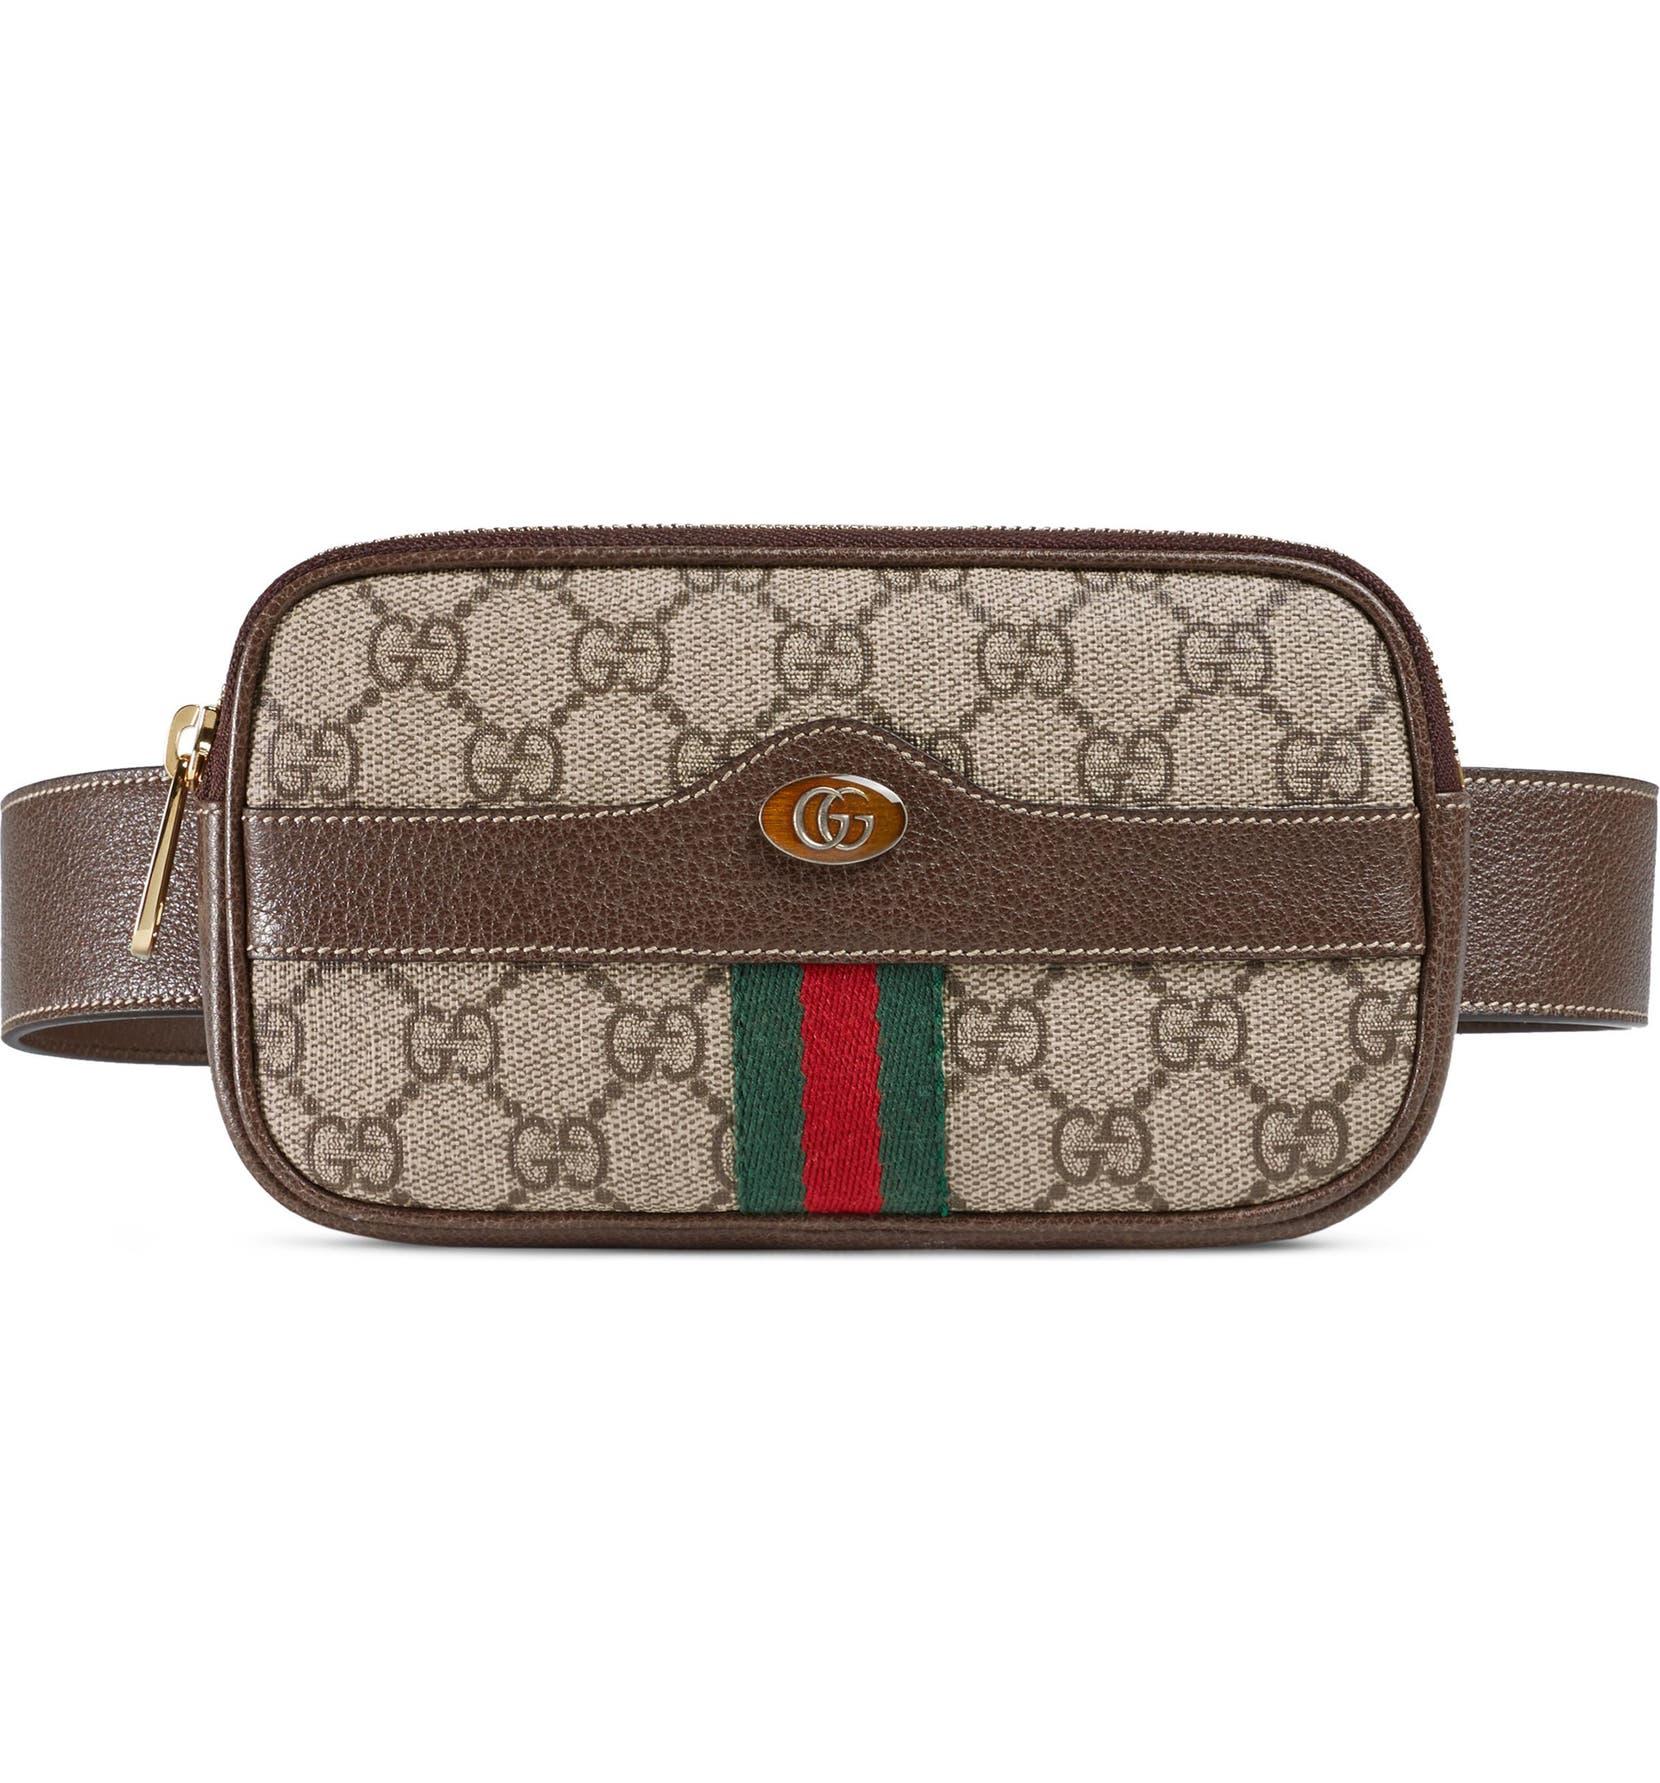 7ec4dd4471a4fd Gucci Ophidia GG Supreme Small Canvas Belt Bag | Nordstrom